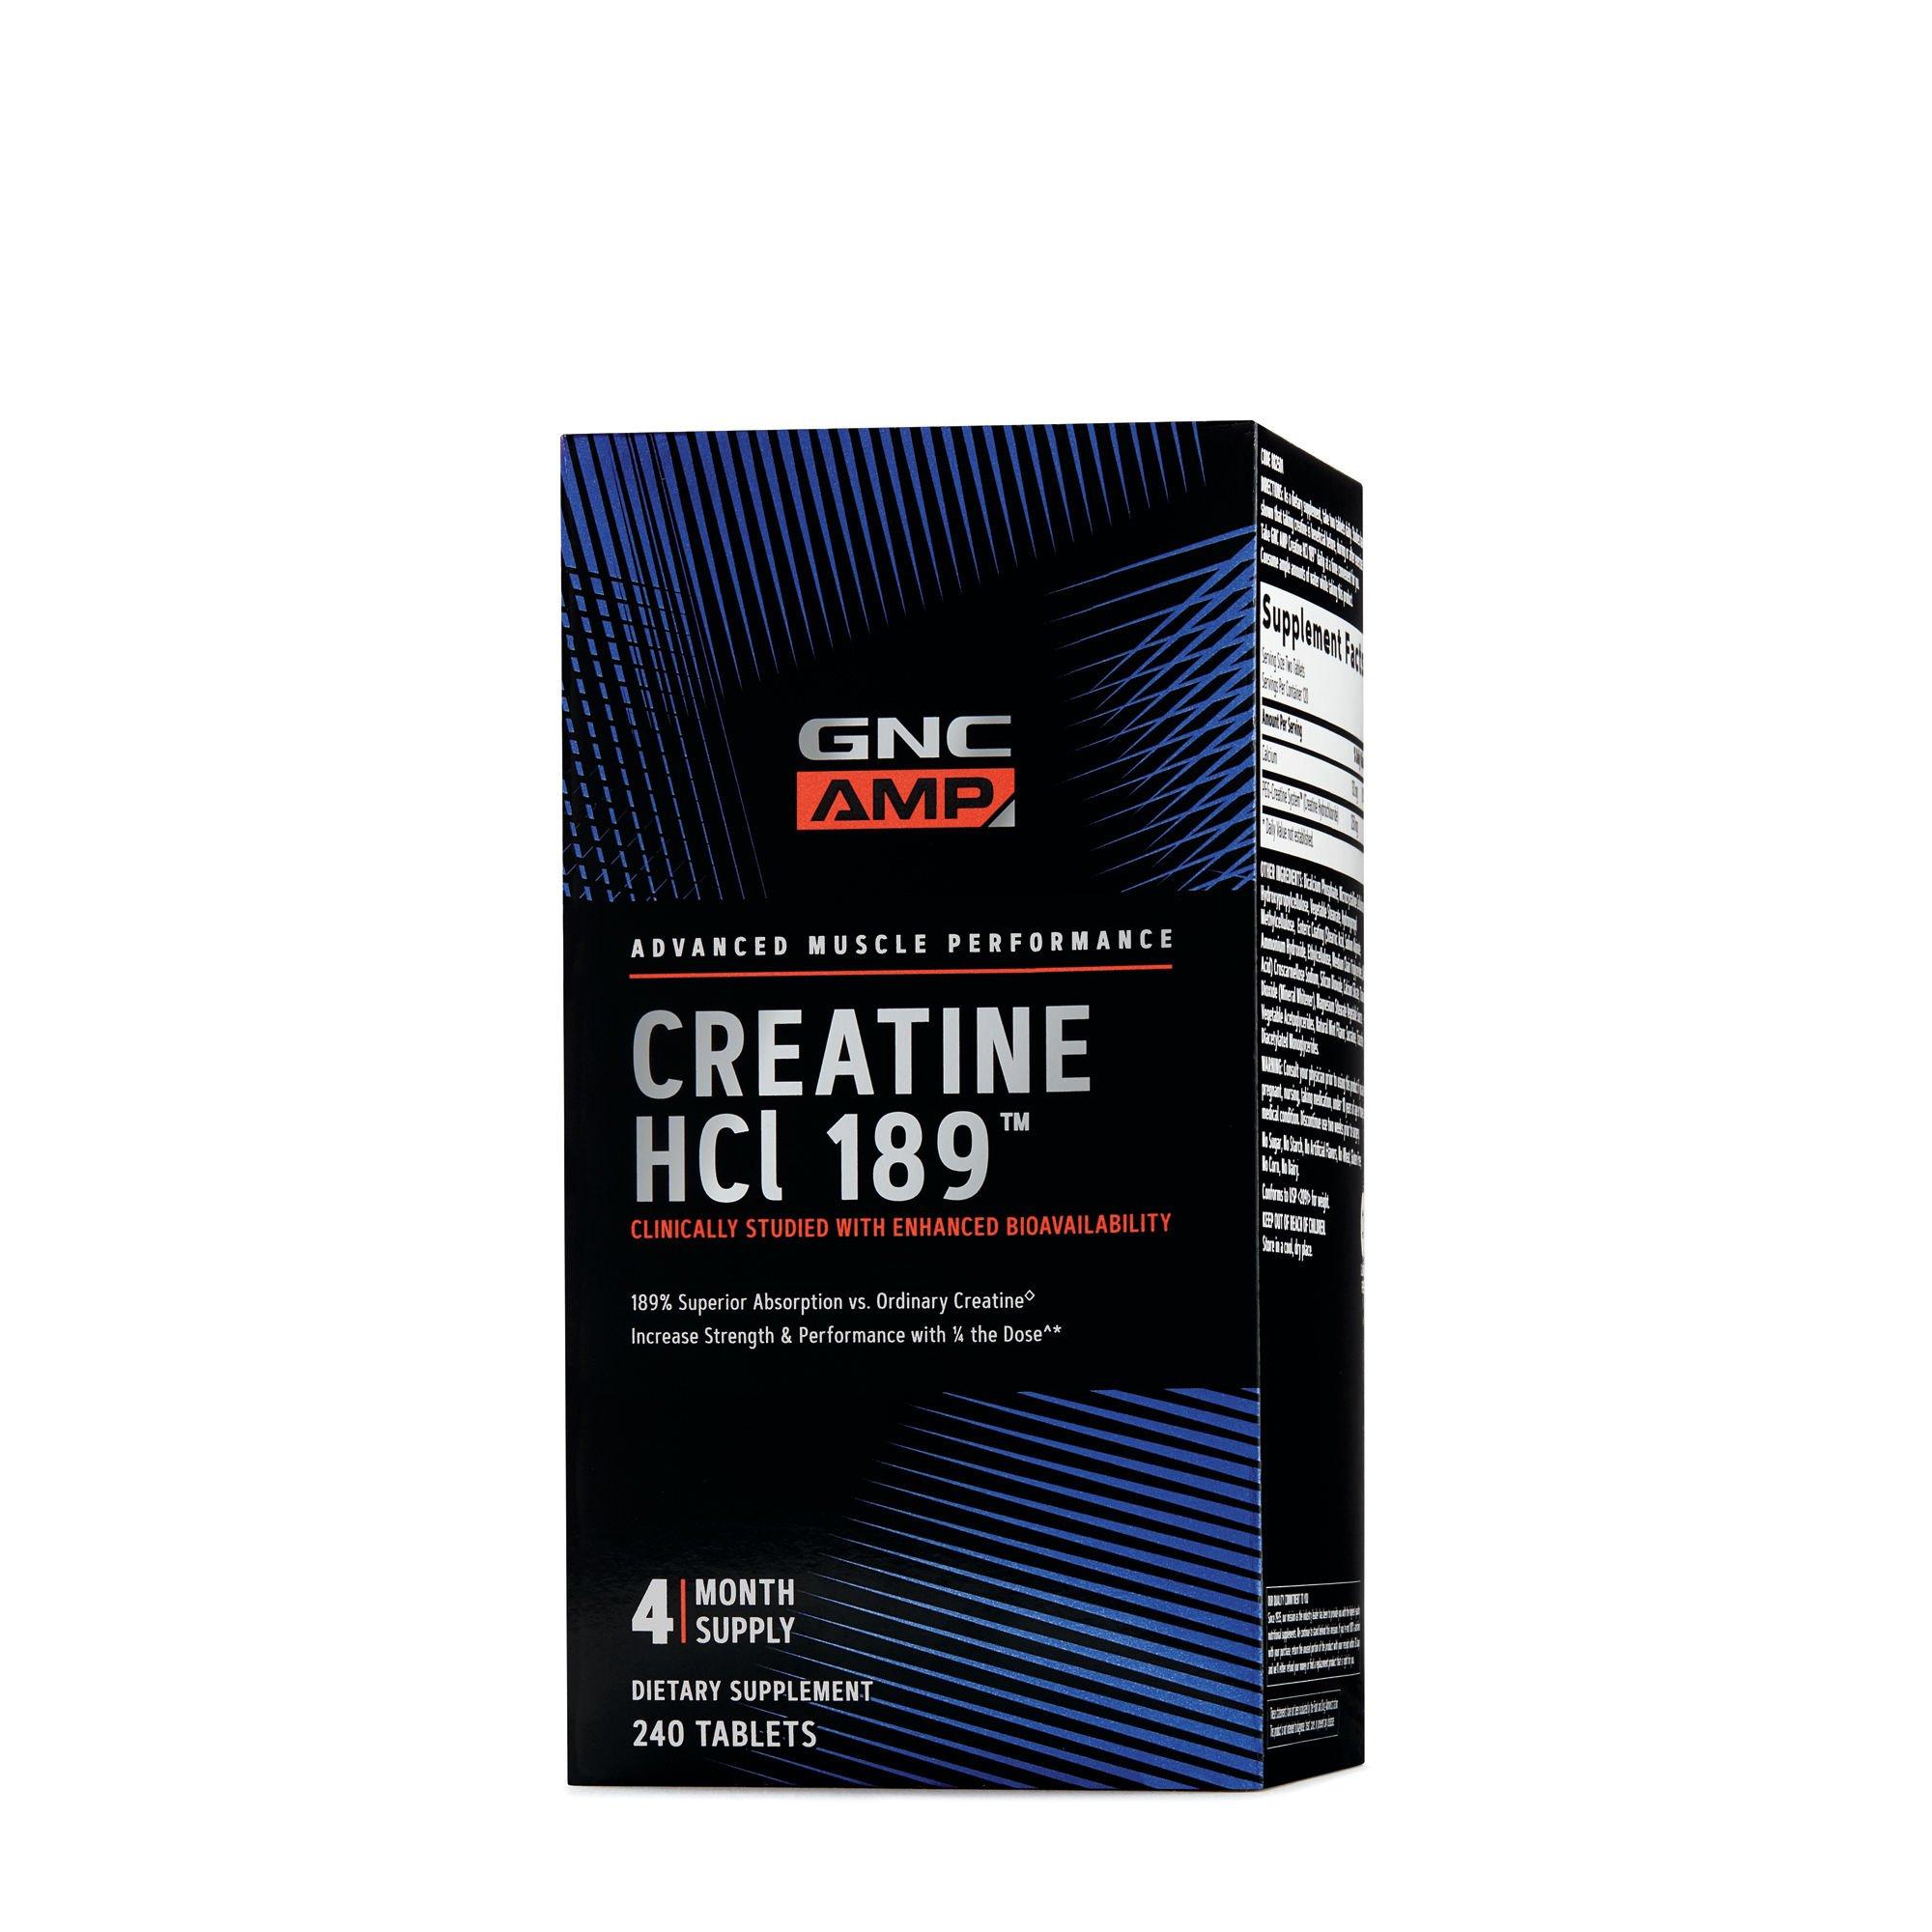 GNC AMP HCl 189, 240 Tablets